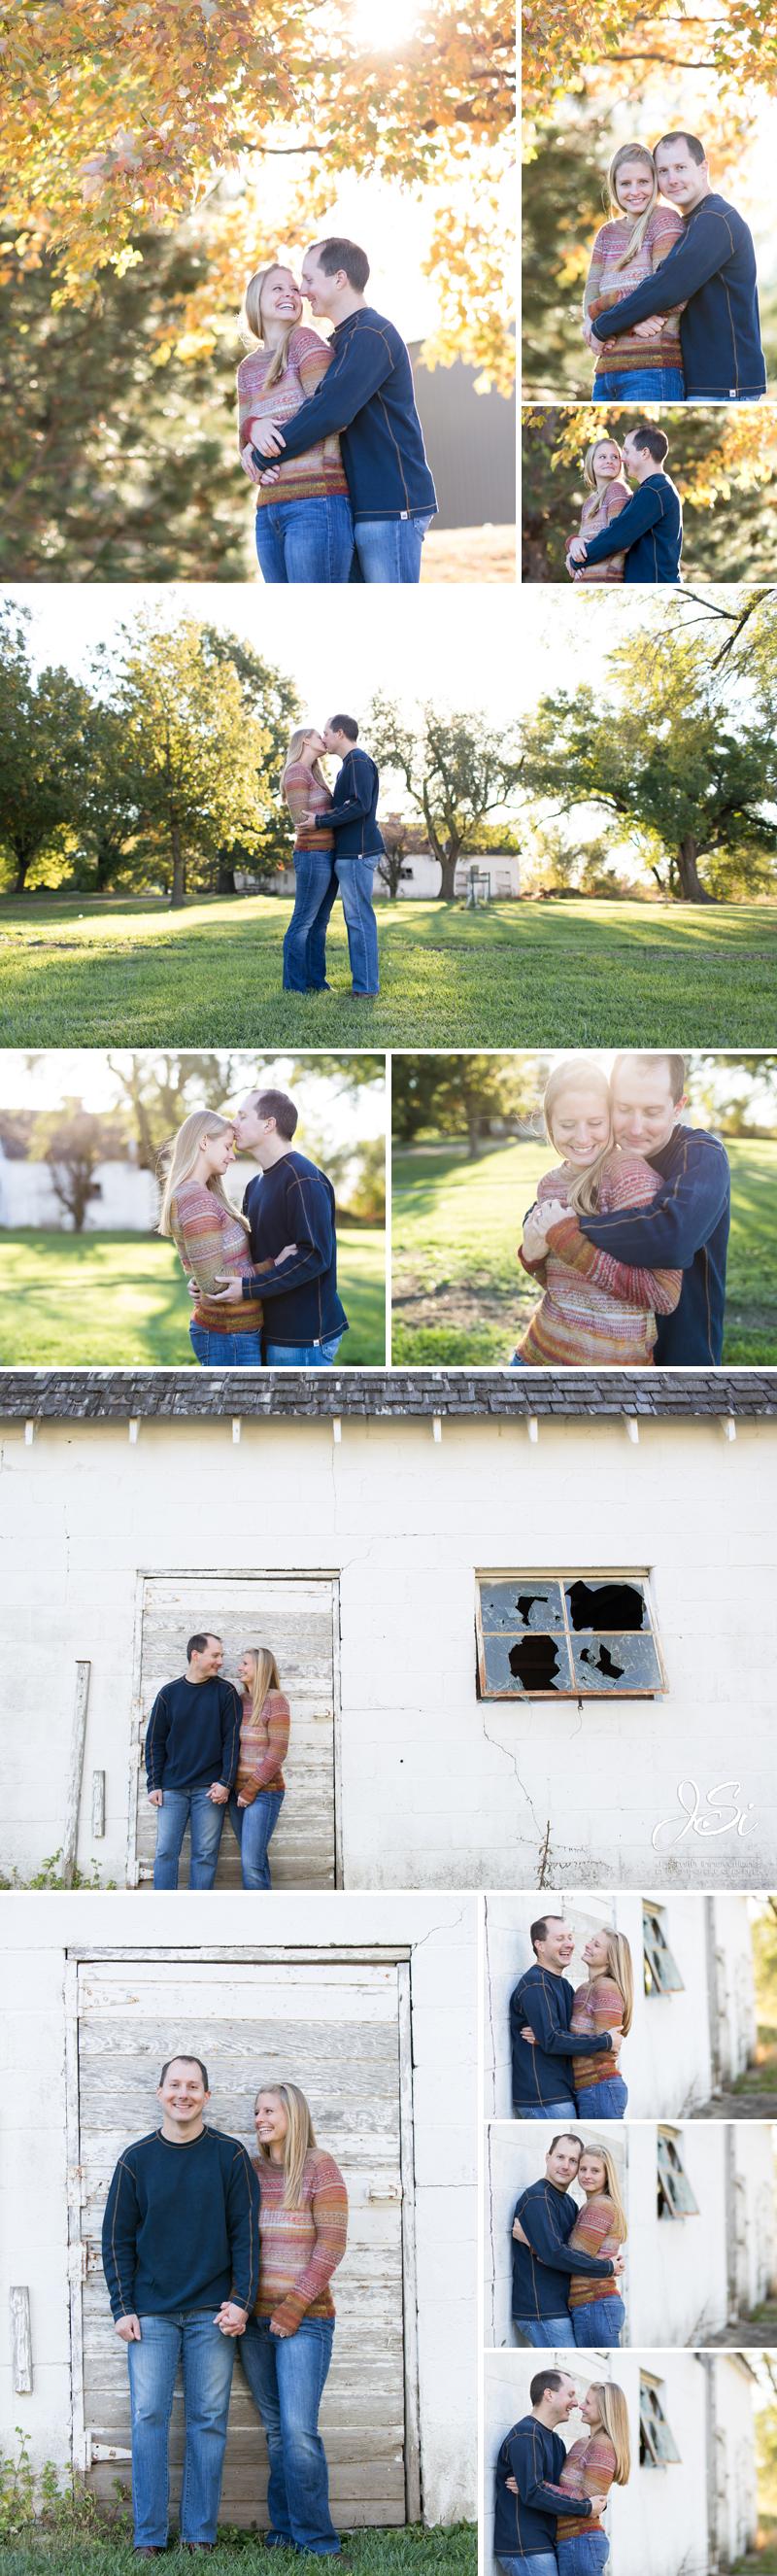 Kansas City Outdoor Engagement Session photo